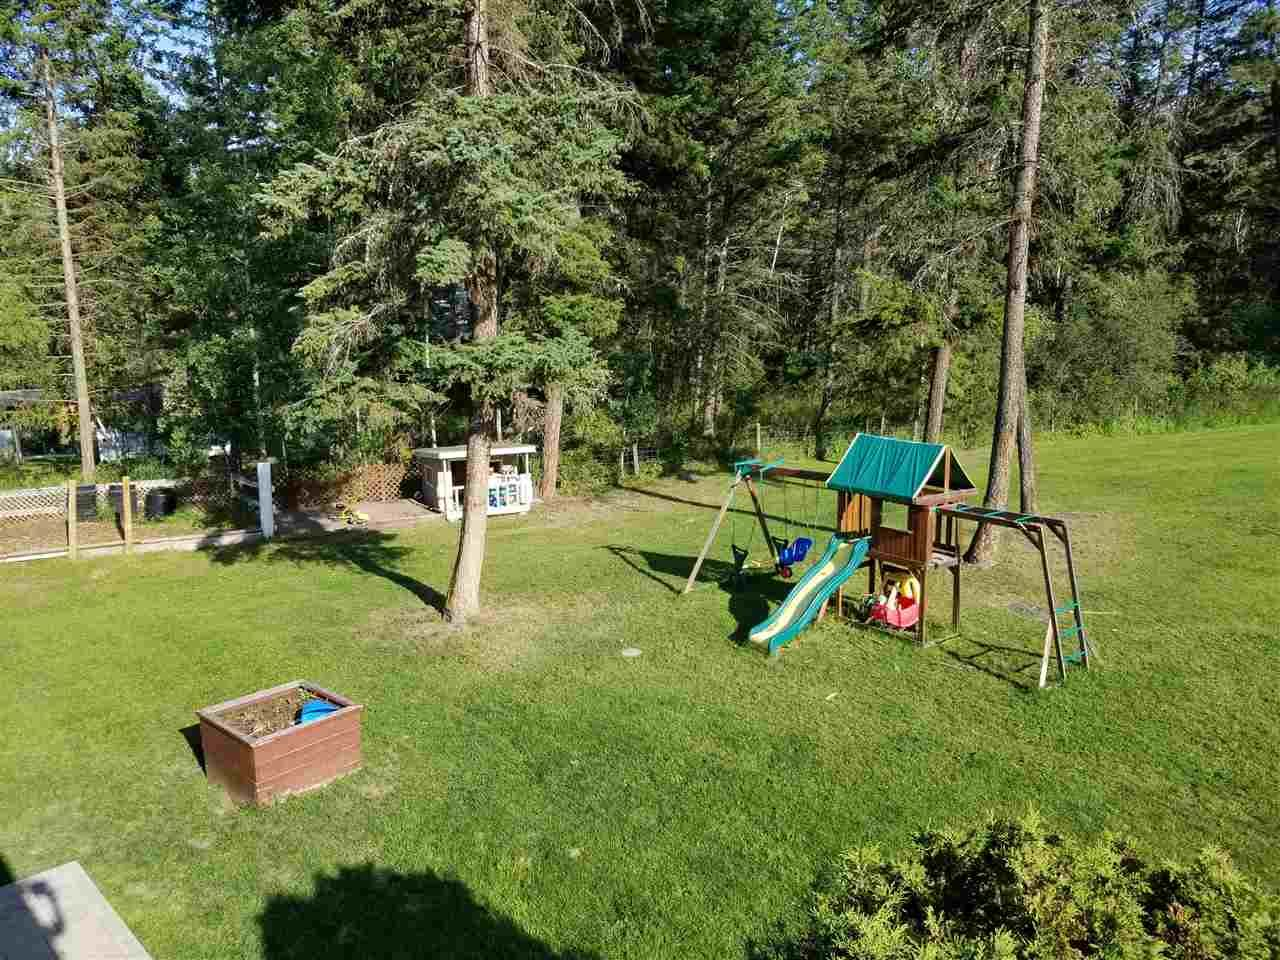 Photo 25: Photos: 511 TAMARACK Road in Williams Lake: Esler/Dog Creek House for sale (Williams Lake (Zone 27))  : MLS®# R2487403